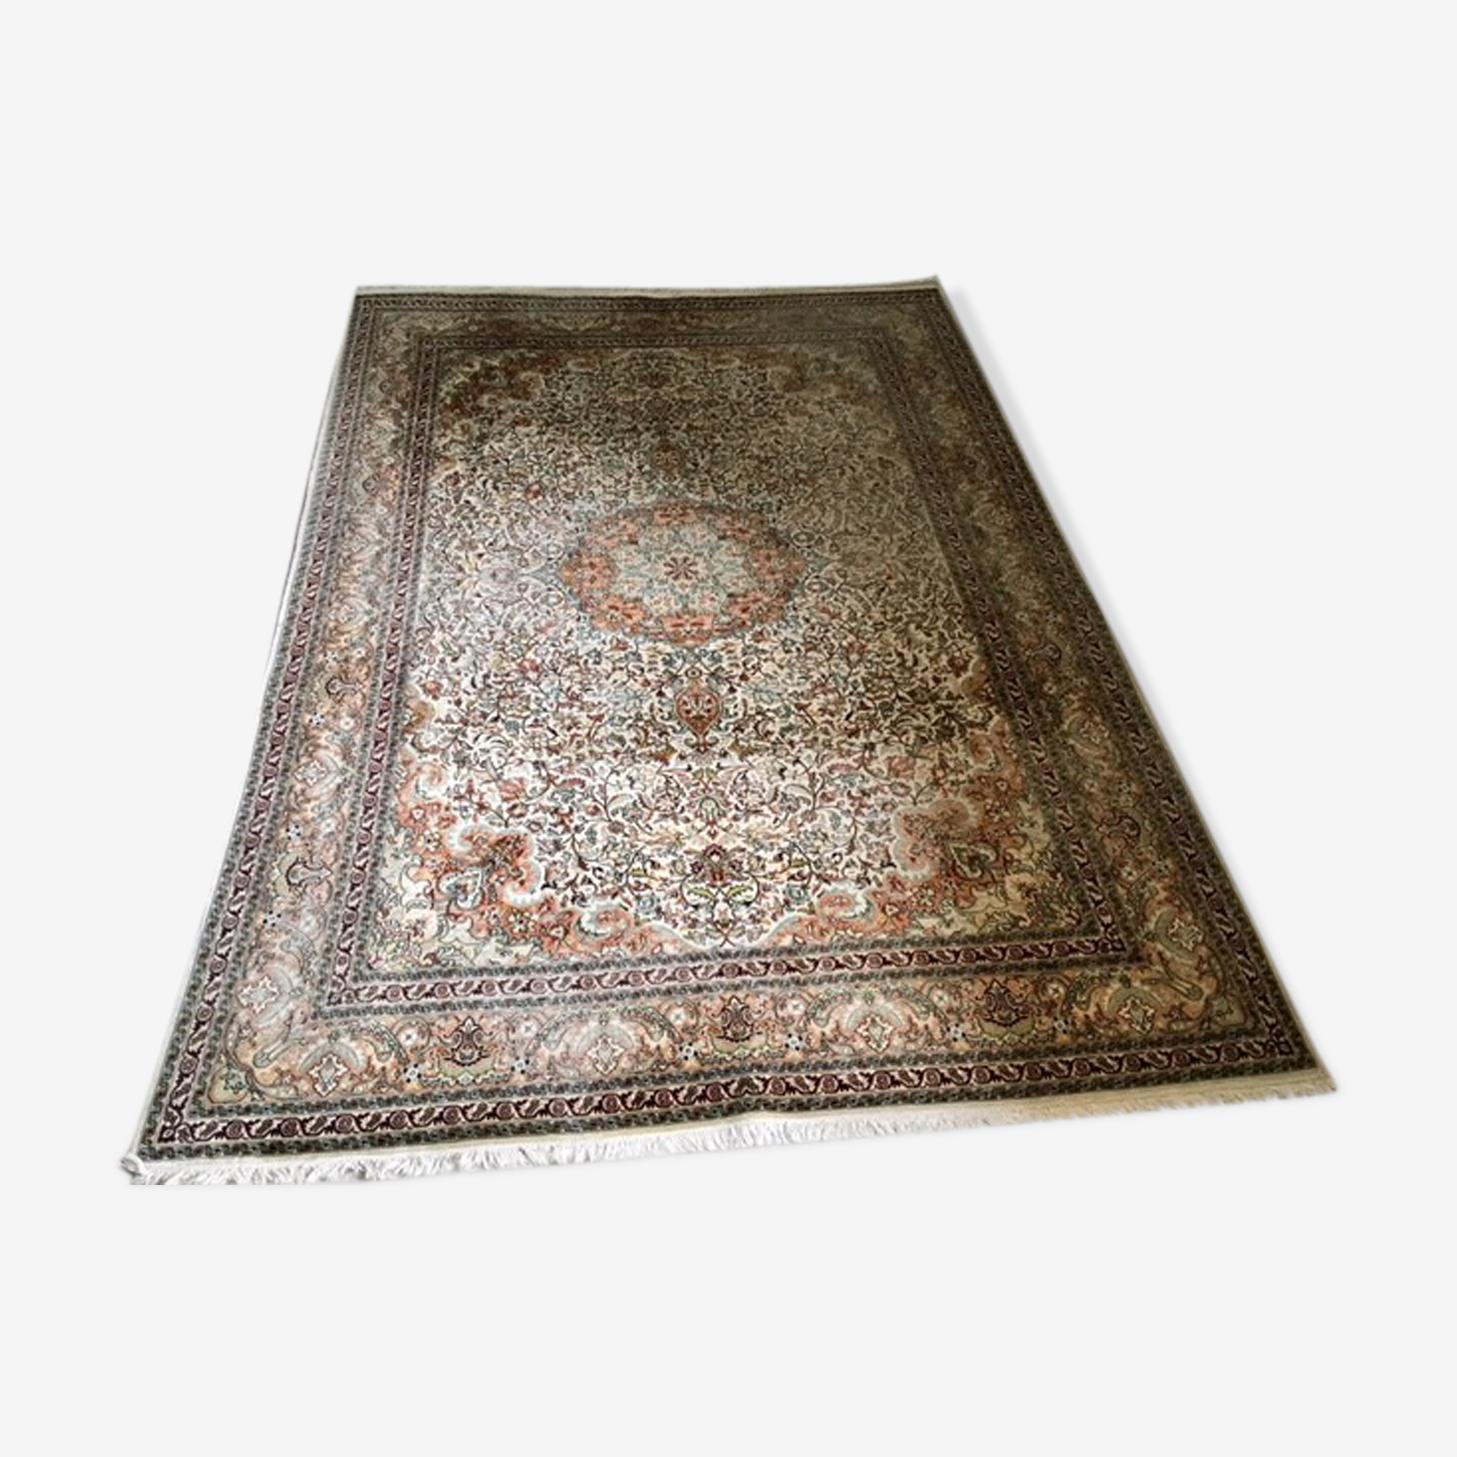 Tapis persan 100% soie  212x305cm